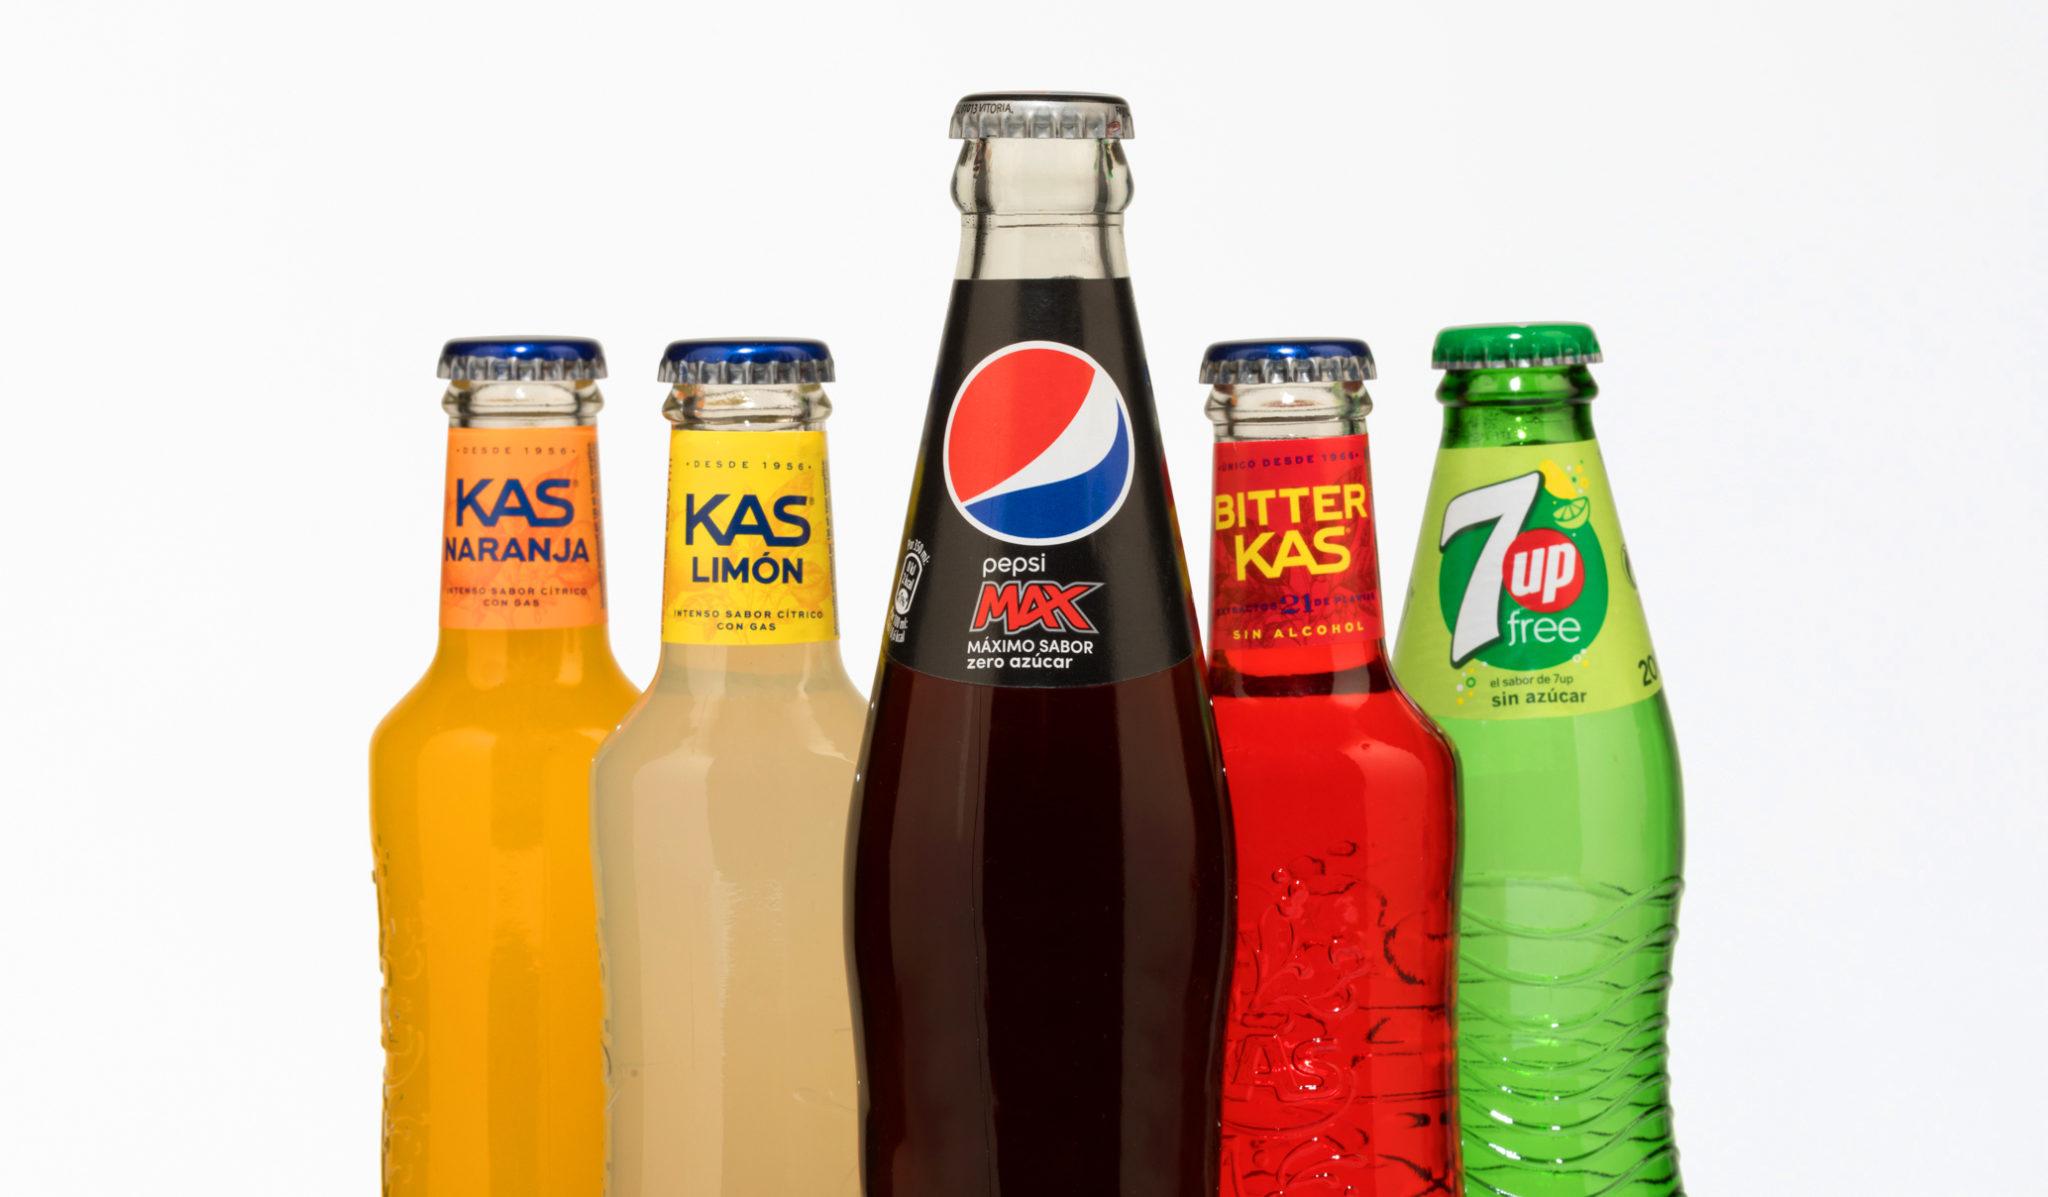 Refrescos Pepsico. Etiquetas encolables. Labelgrafic